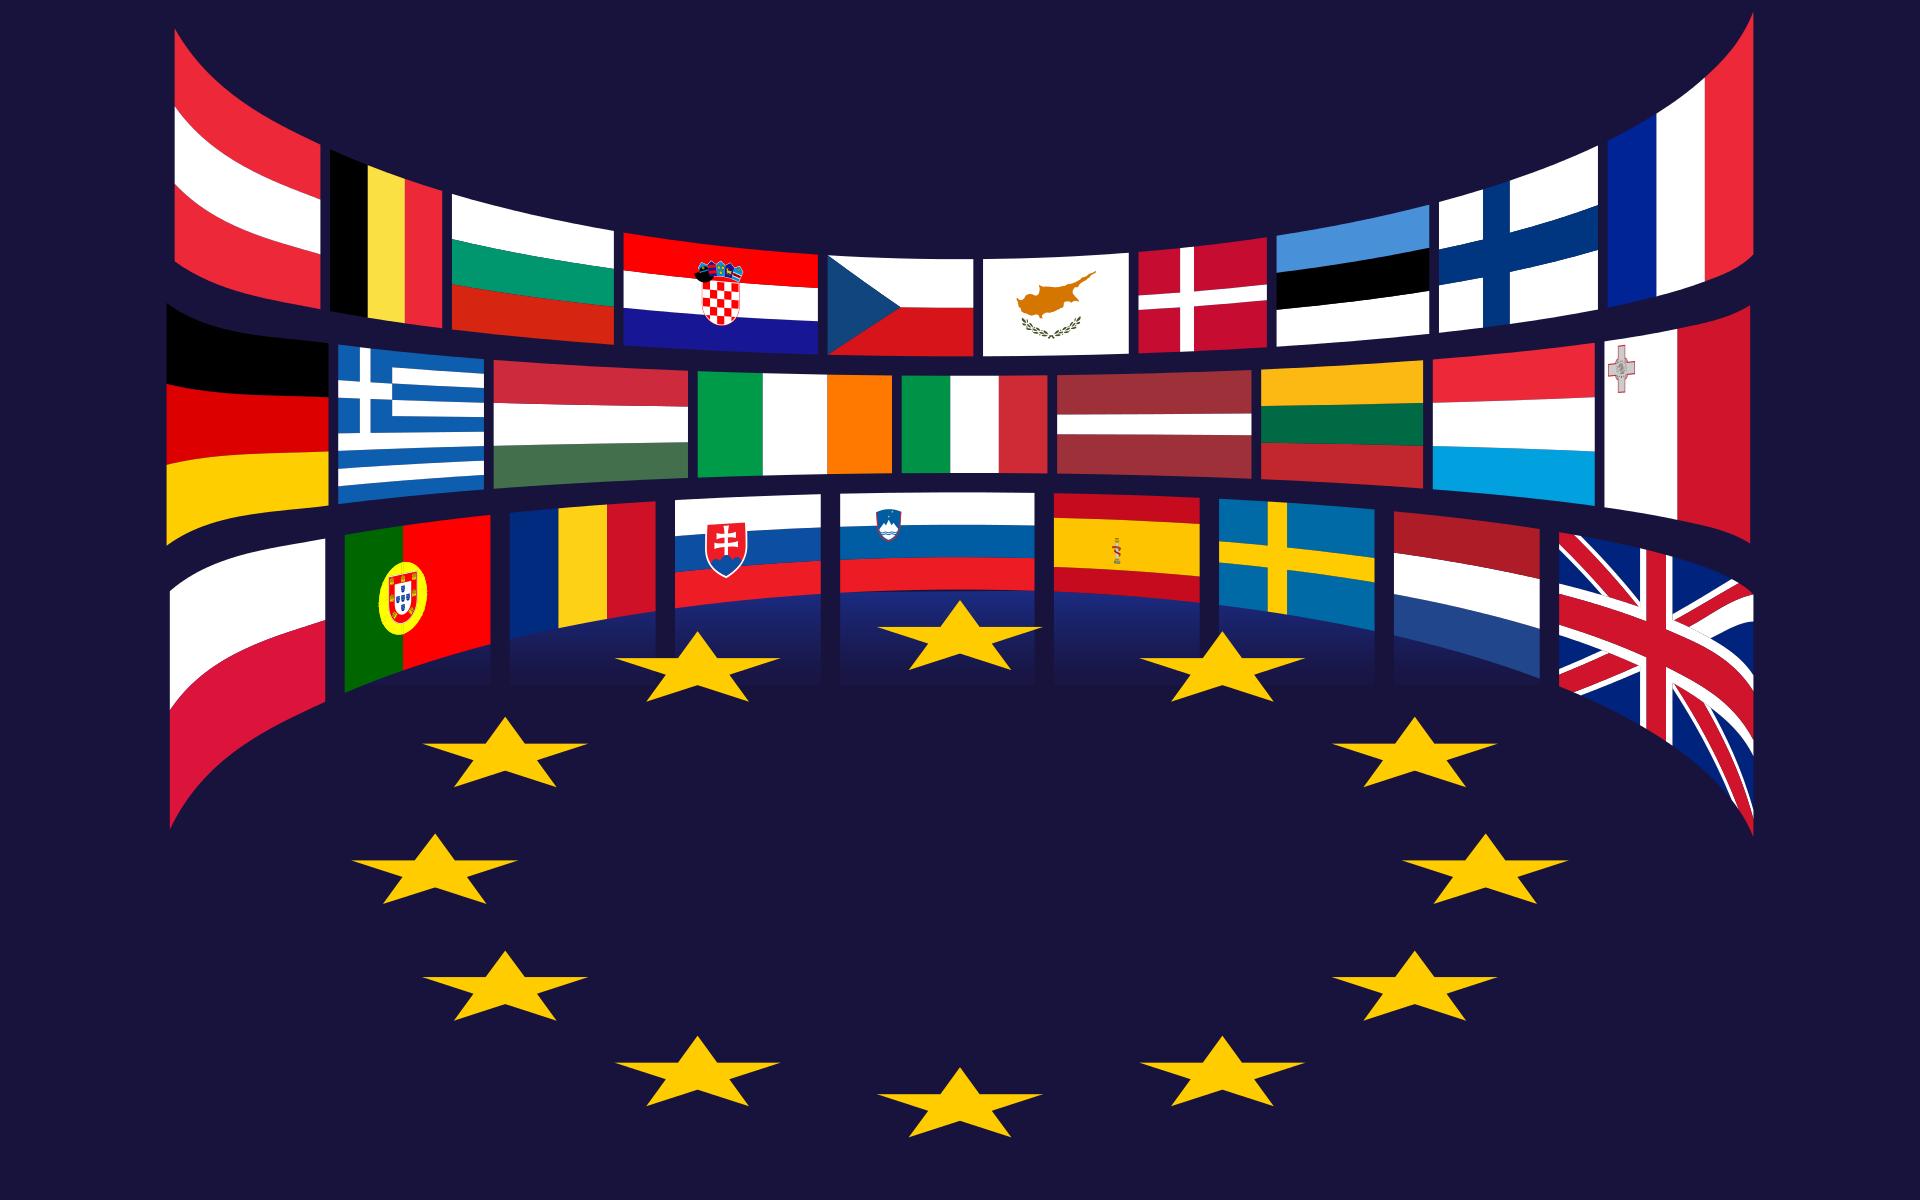 Český stát versus Evropská unie